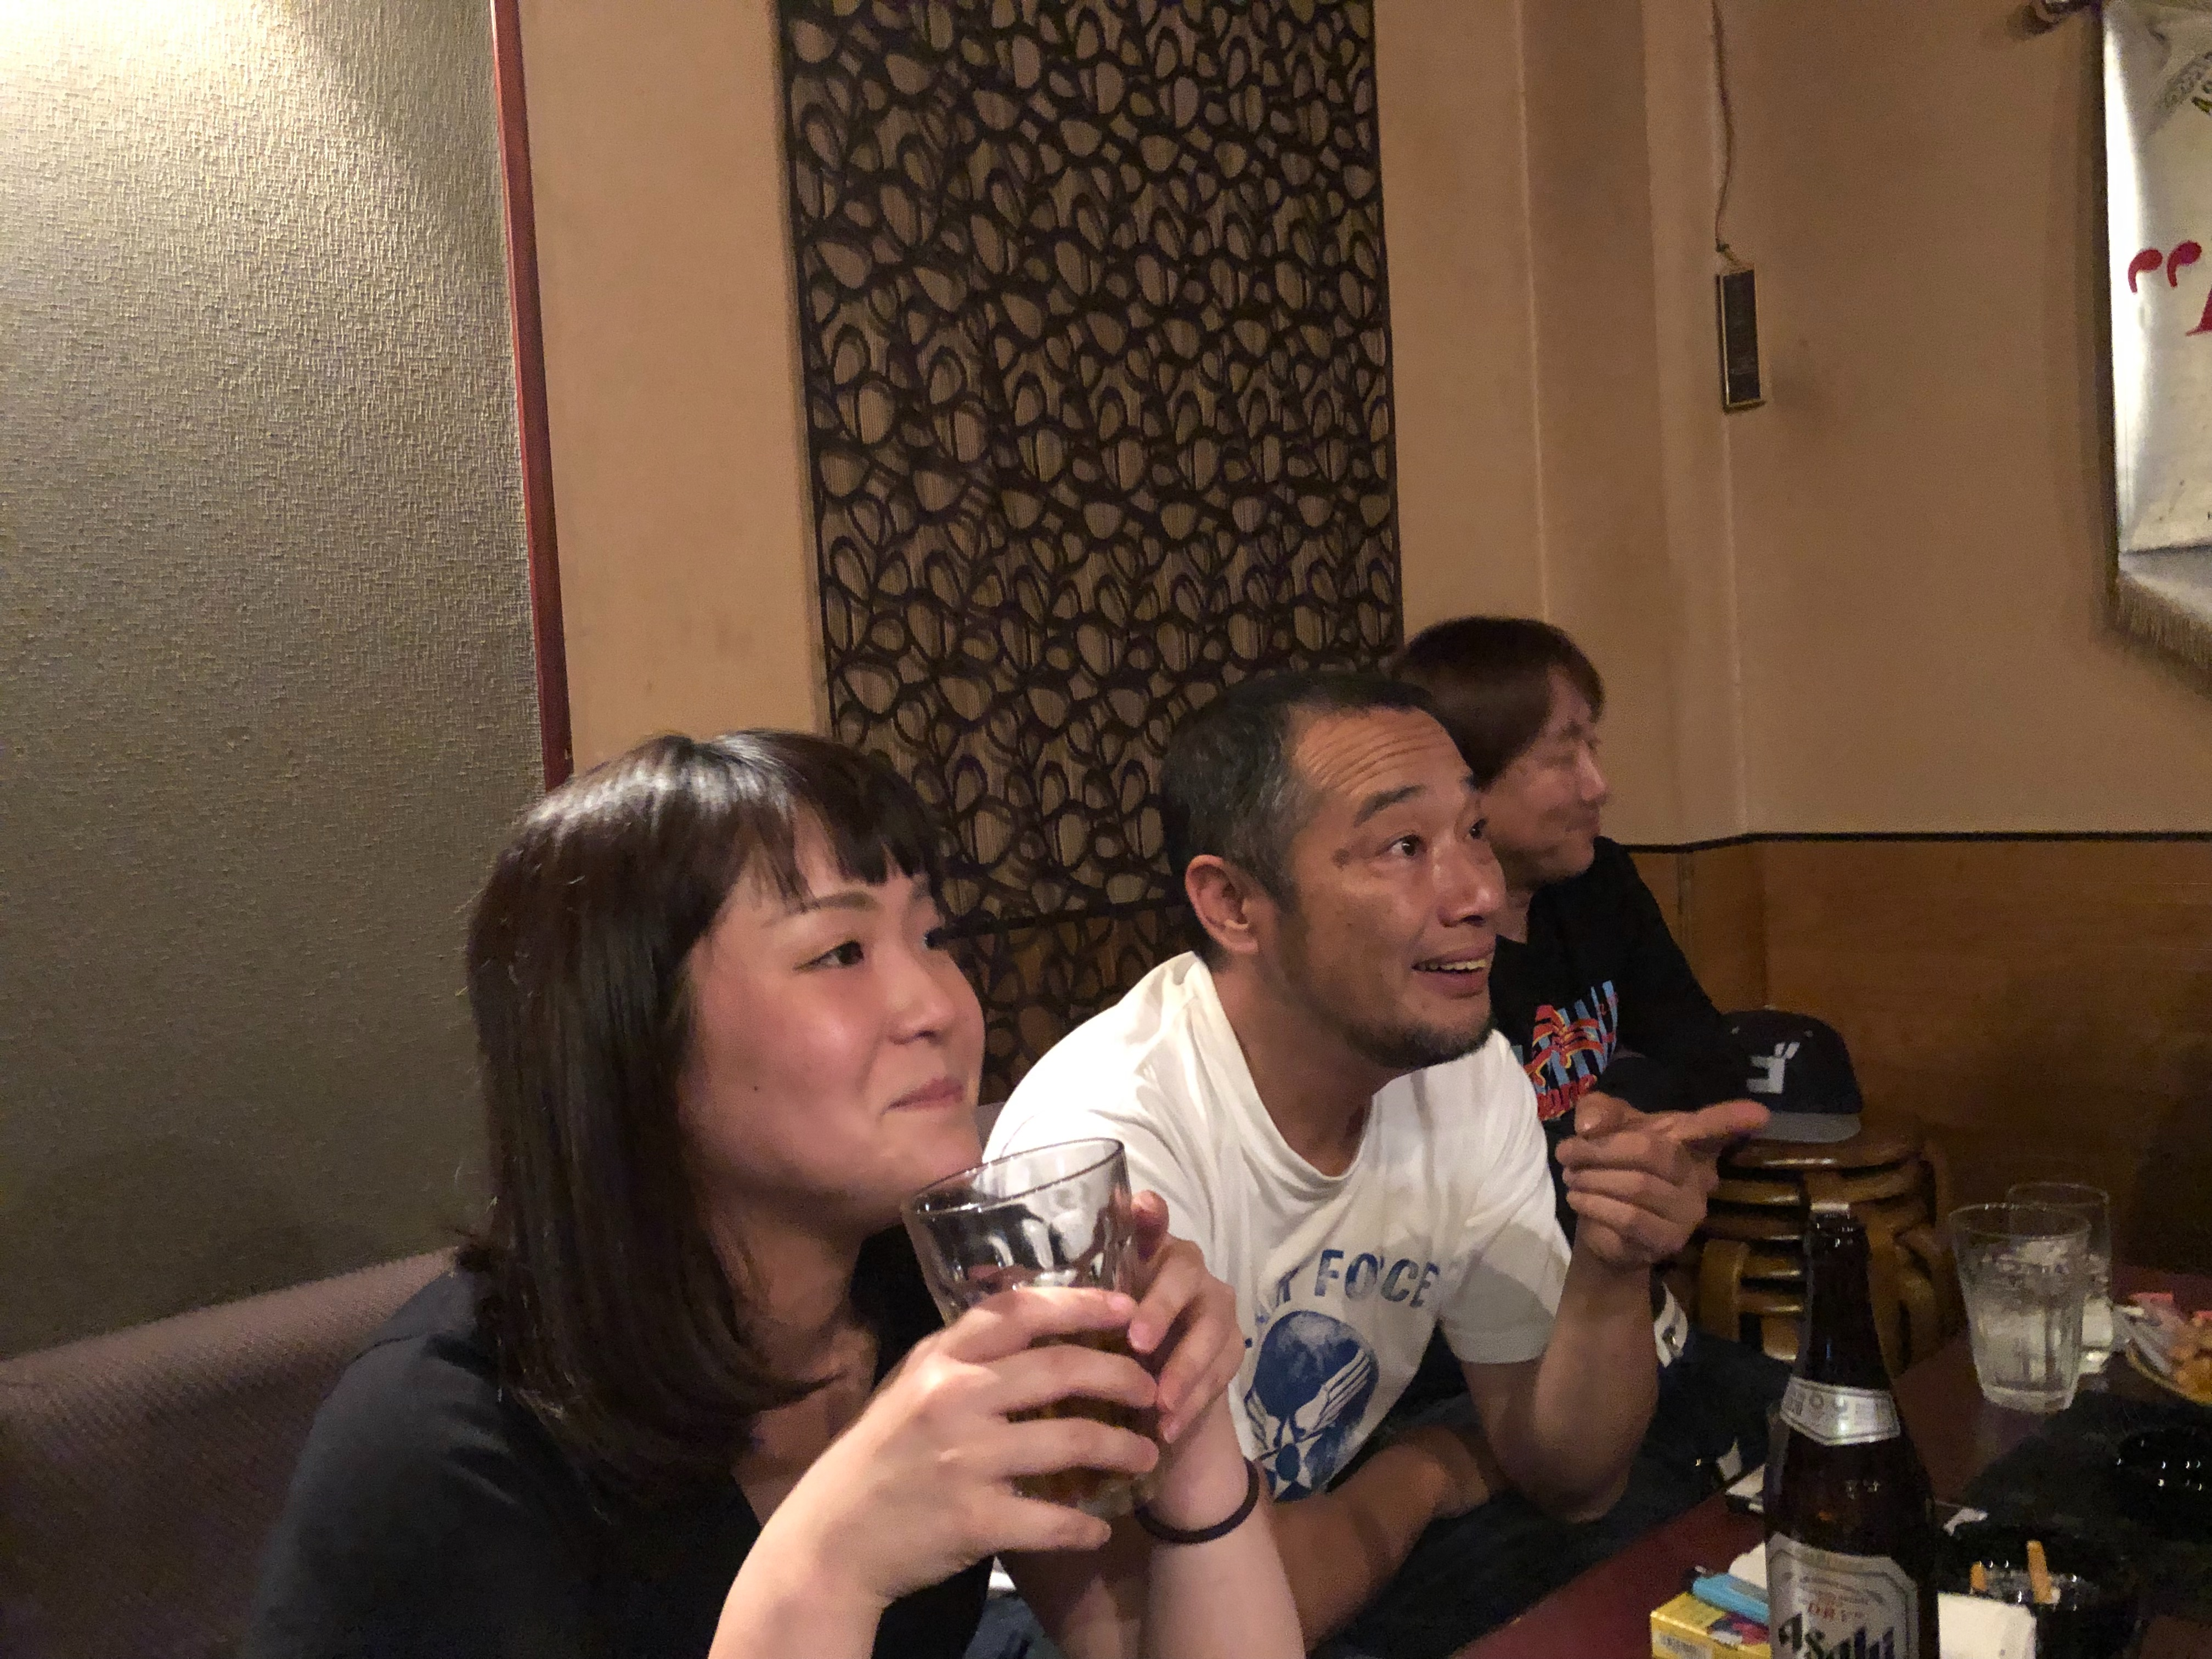 f:id:masanori-kato1972:20190526185546j:image